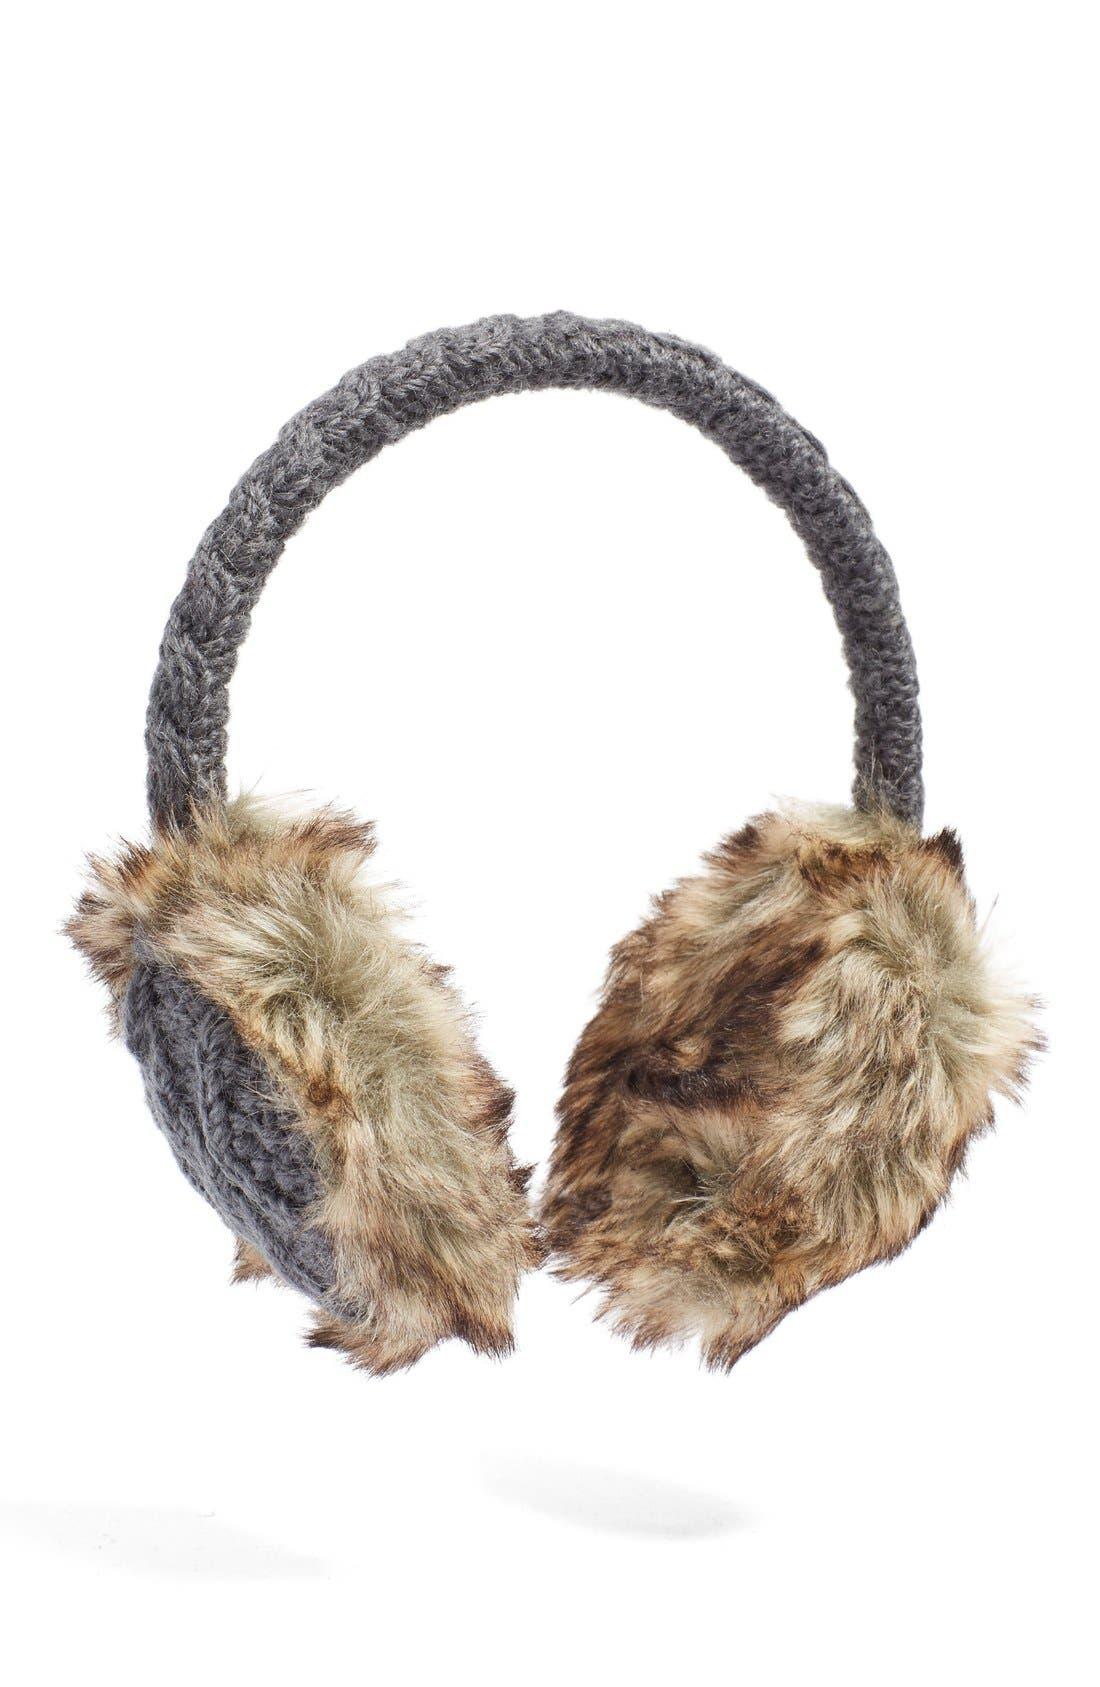 Nirvanna Designs Cable Knit Earmuffs